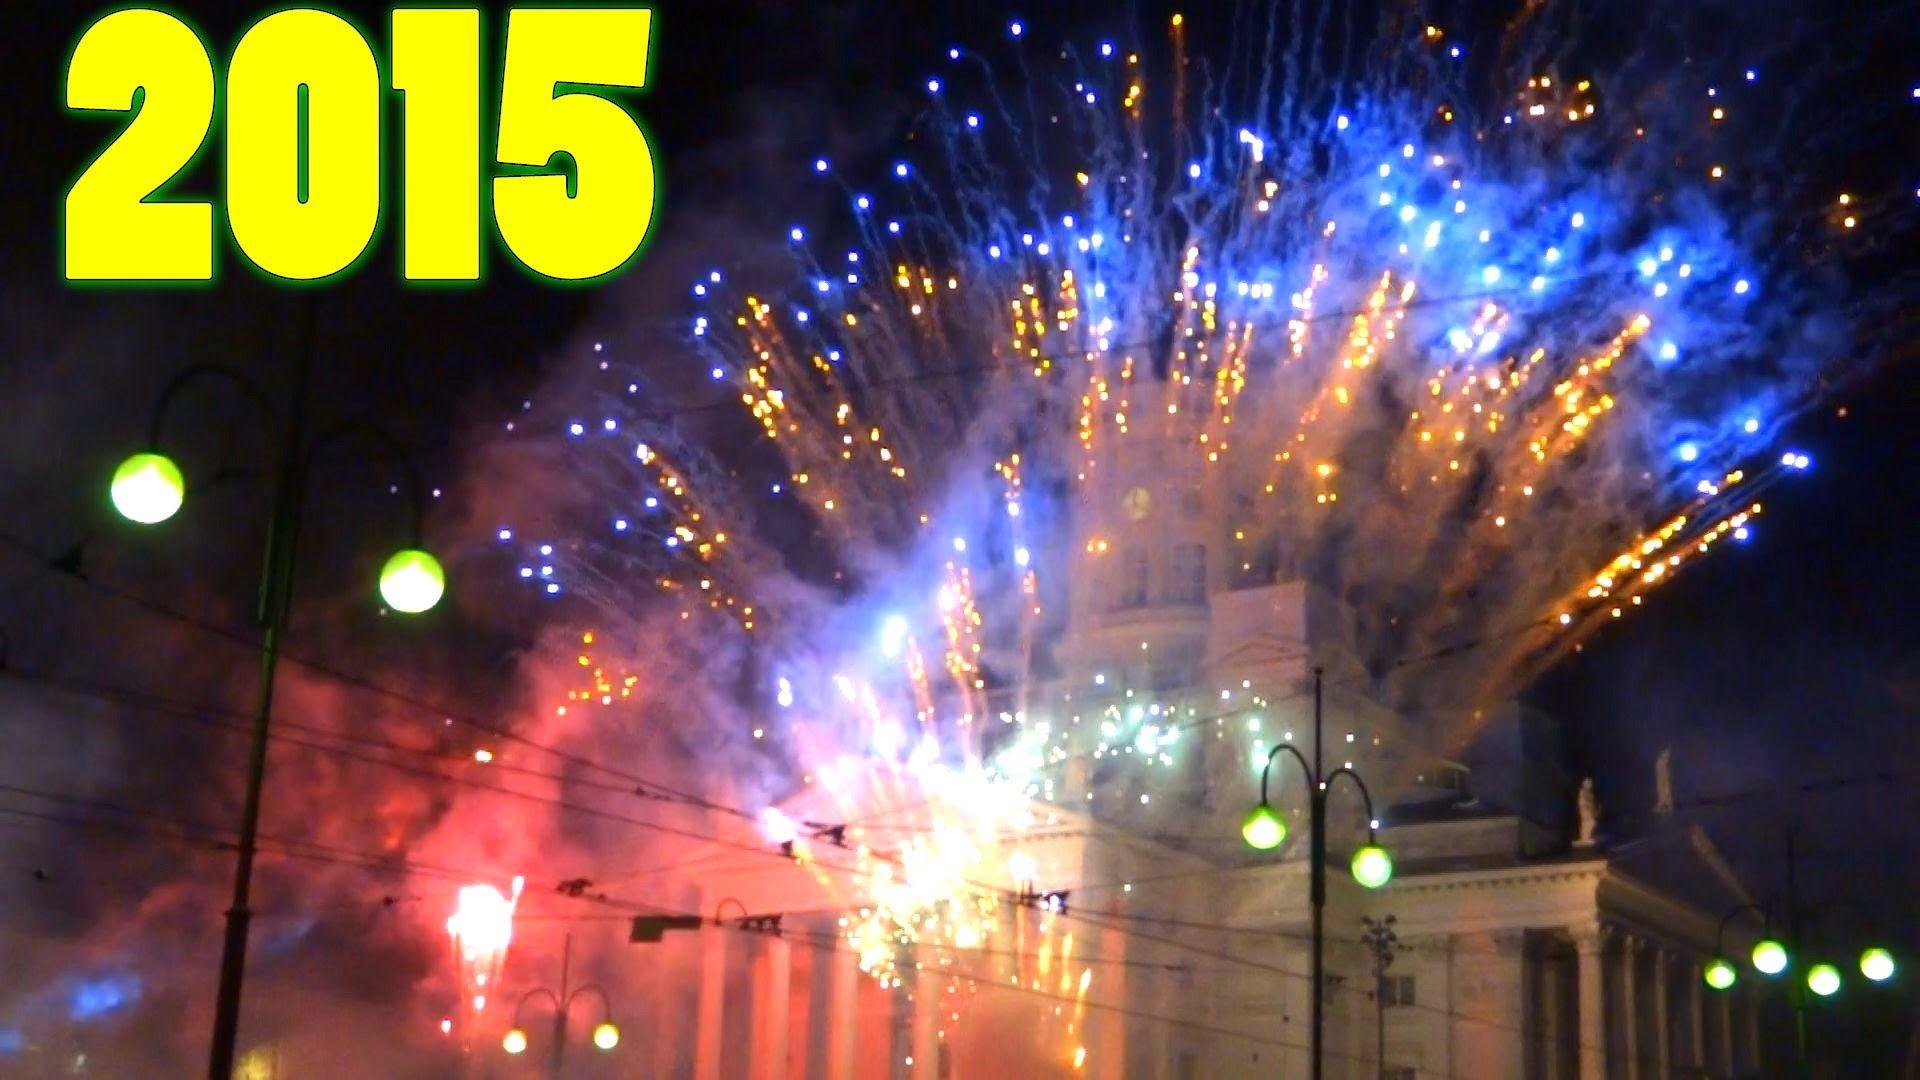 New Year's Eve in Finland Helsinki 2015 Fireworks